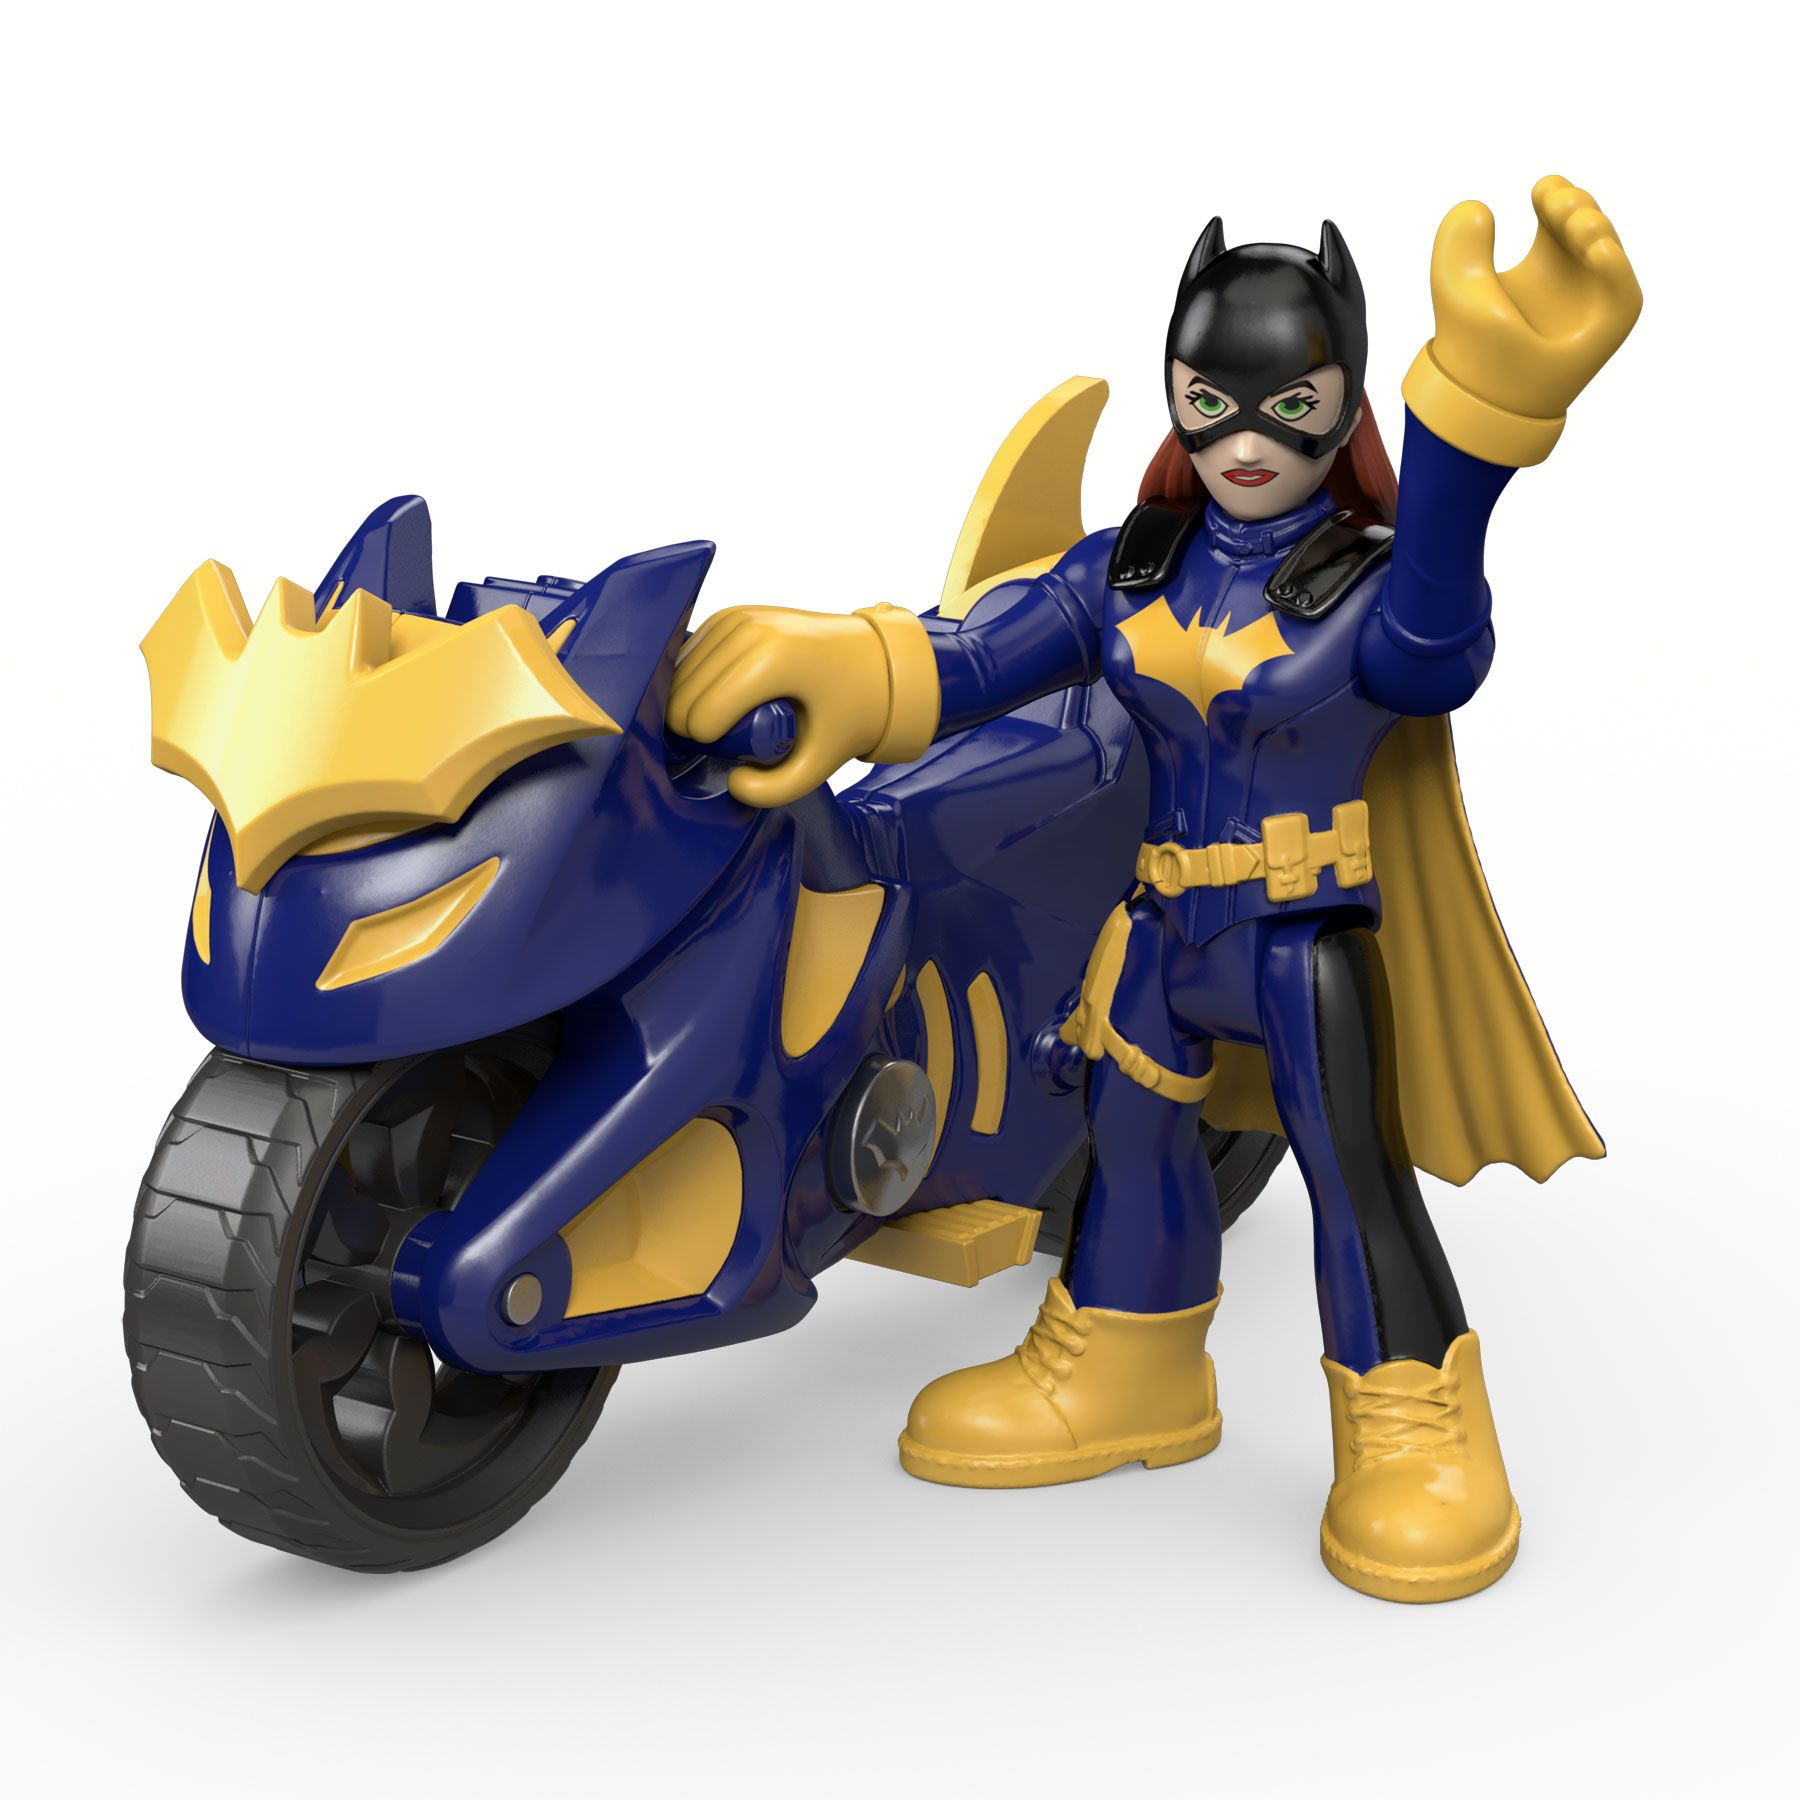 Imaginext Batgirl She s real Finally